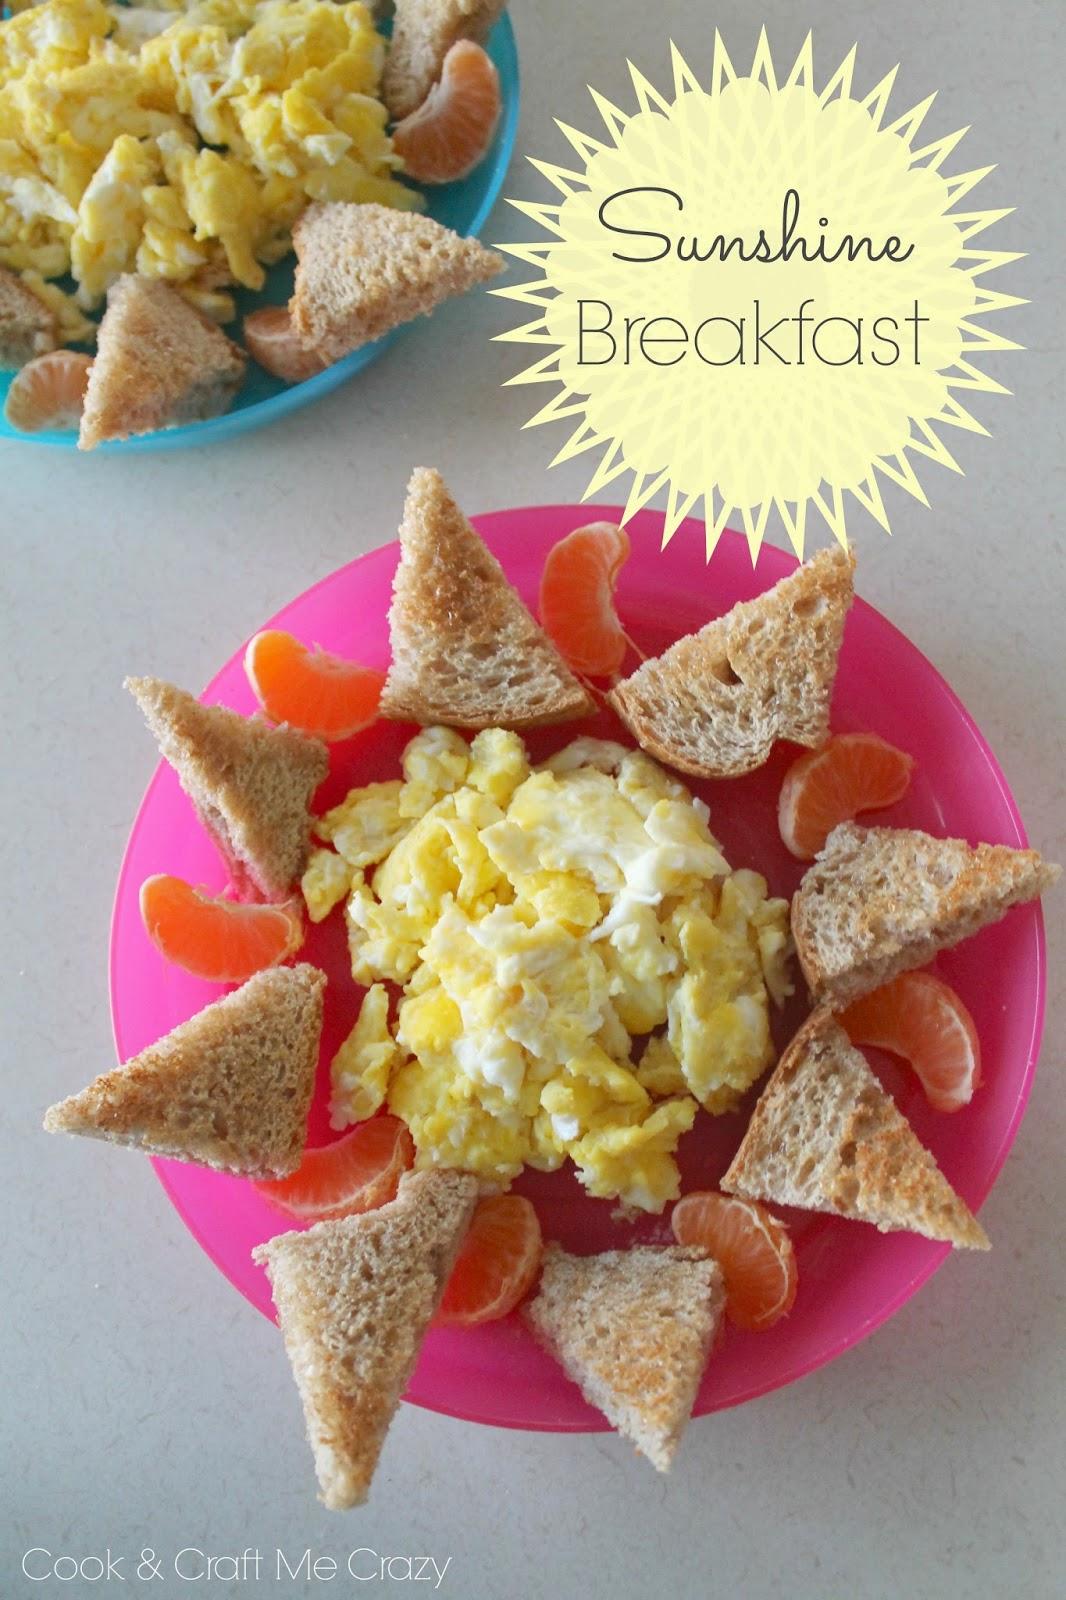 http://cookandcraftmecrazy.blogspot.com/2015/04/sunshine-breakfast.html